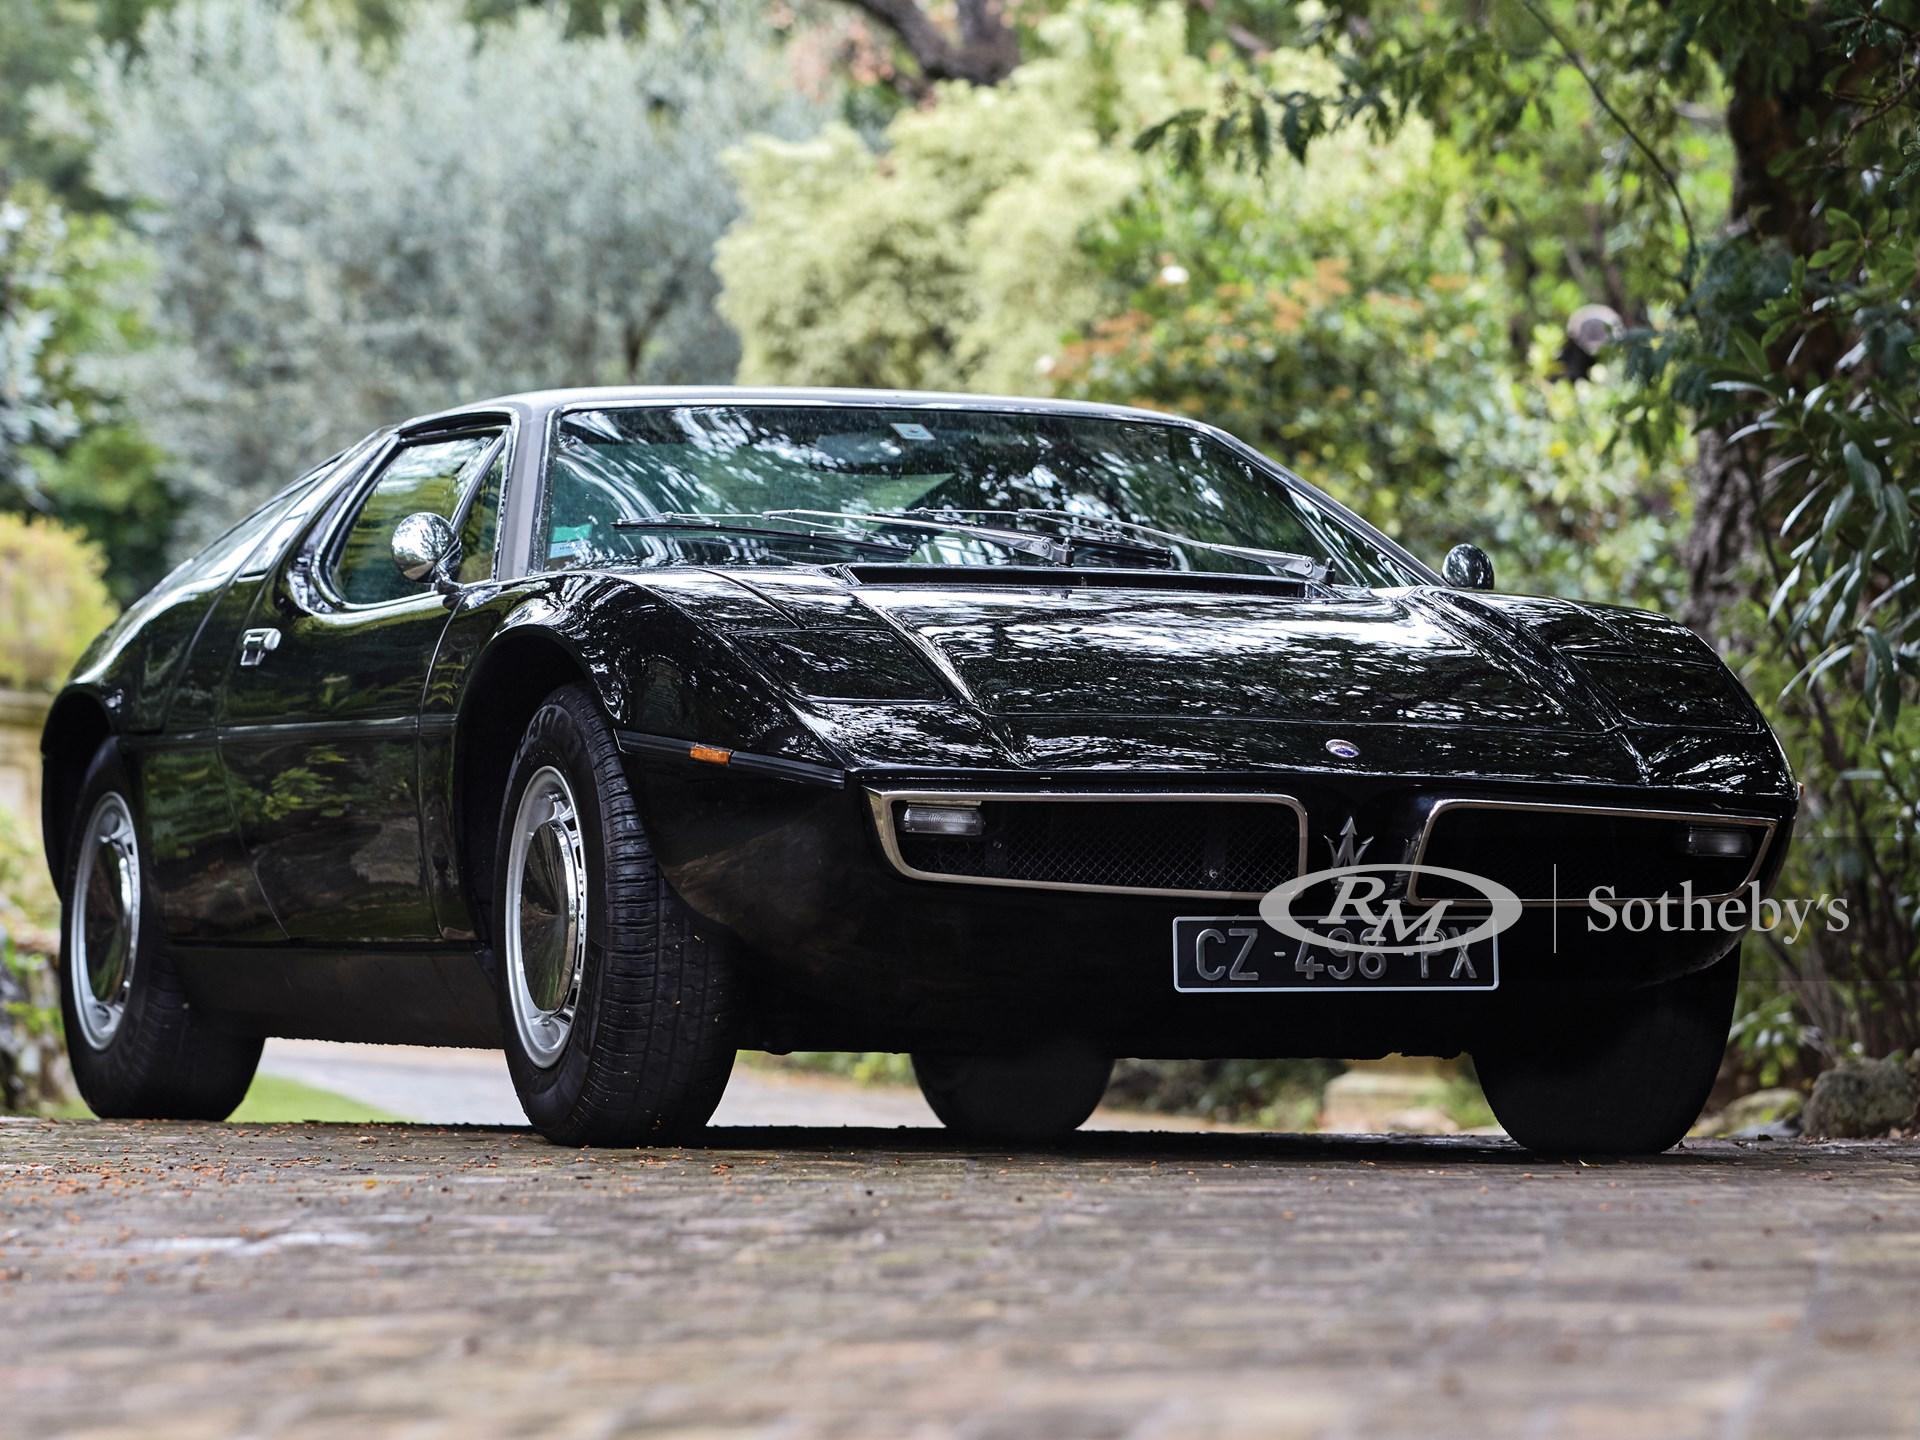 1975 Maserati Bora 4.7 | Monaco 2016 | RM Sotheby's